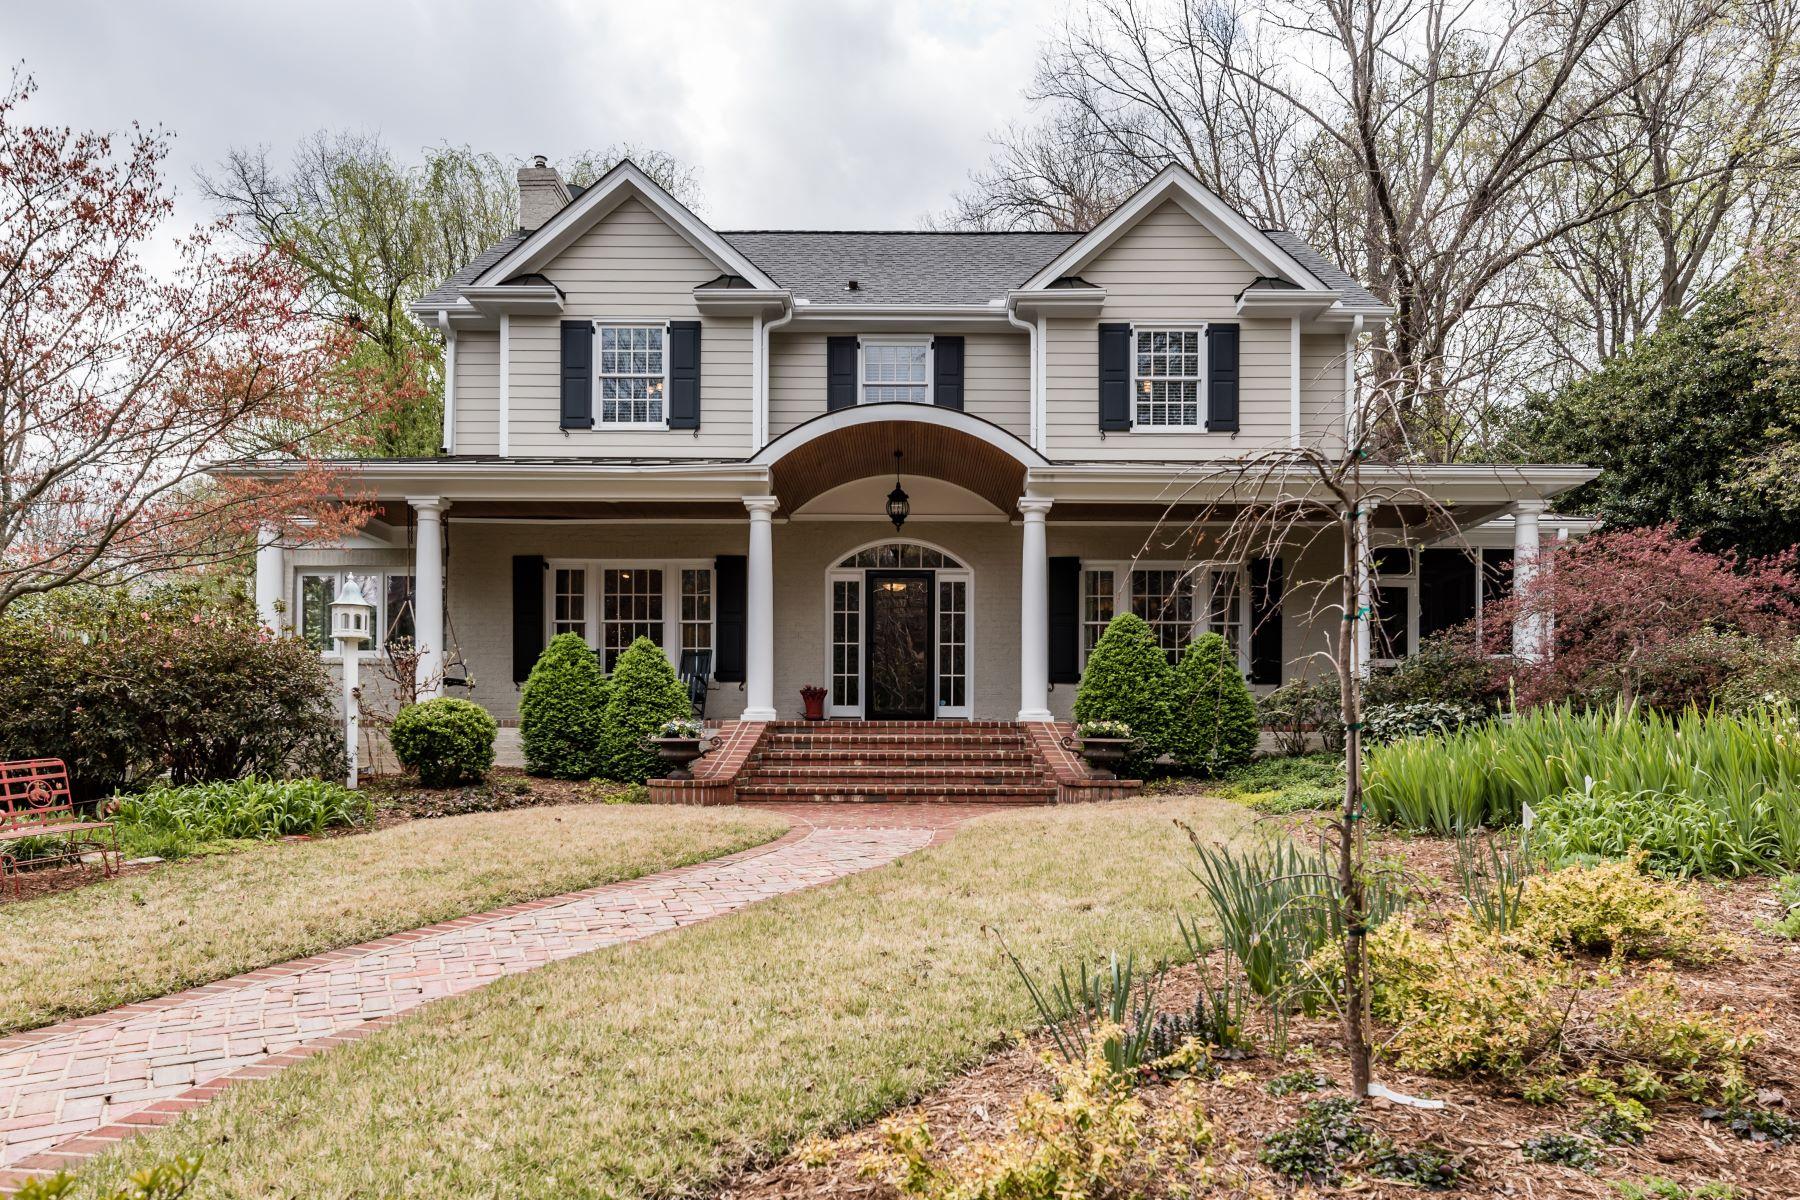 Single Family Home for Sale at Harvey Street 807 Harvey Street Raleigh, North Carolina, 27608 United StatesIn/Around: Cary, Chapel Hill, Durham